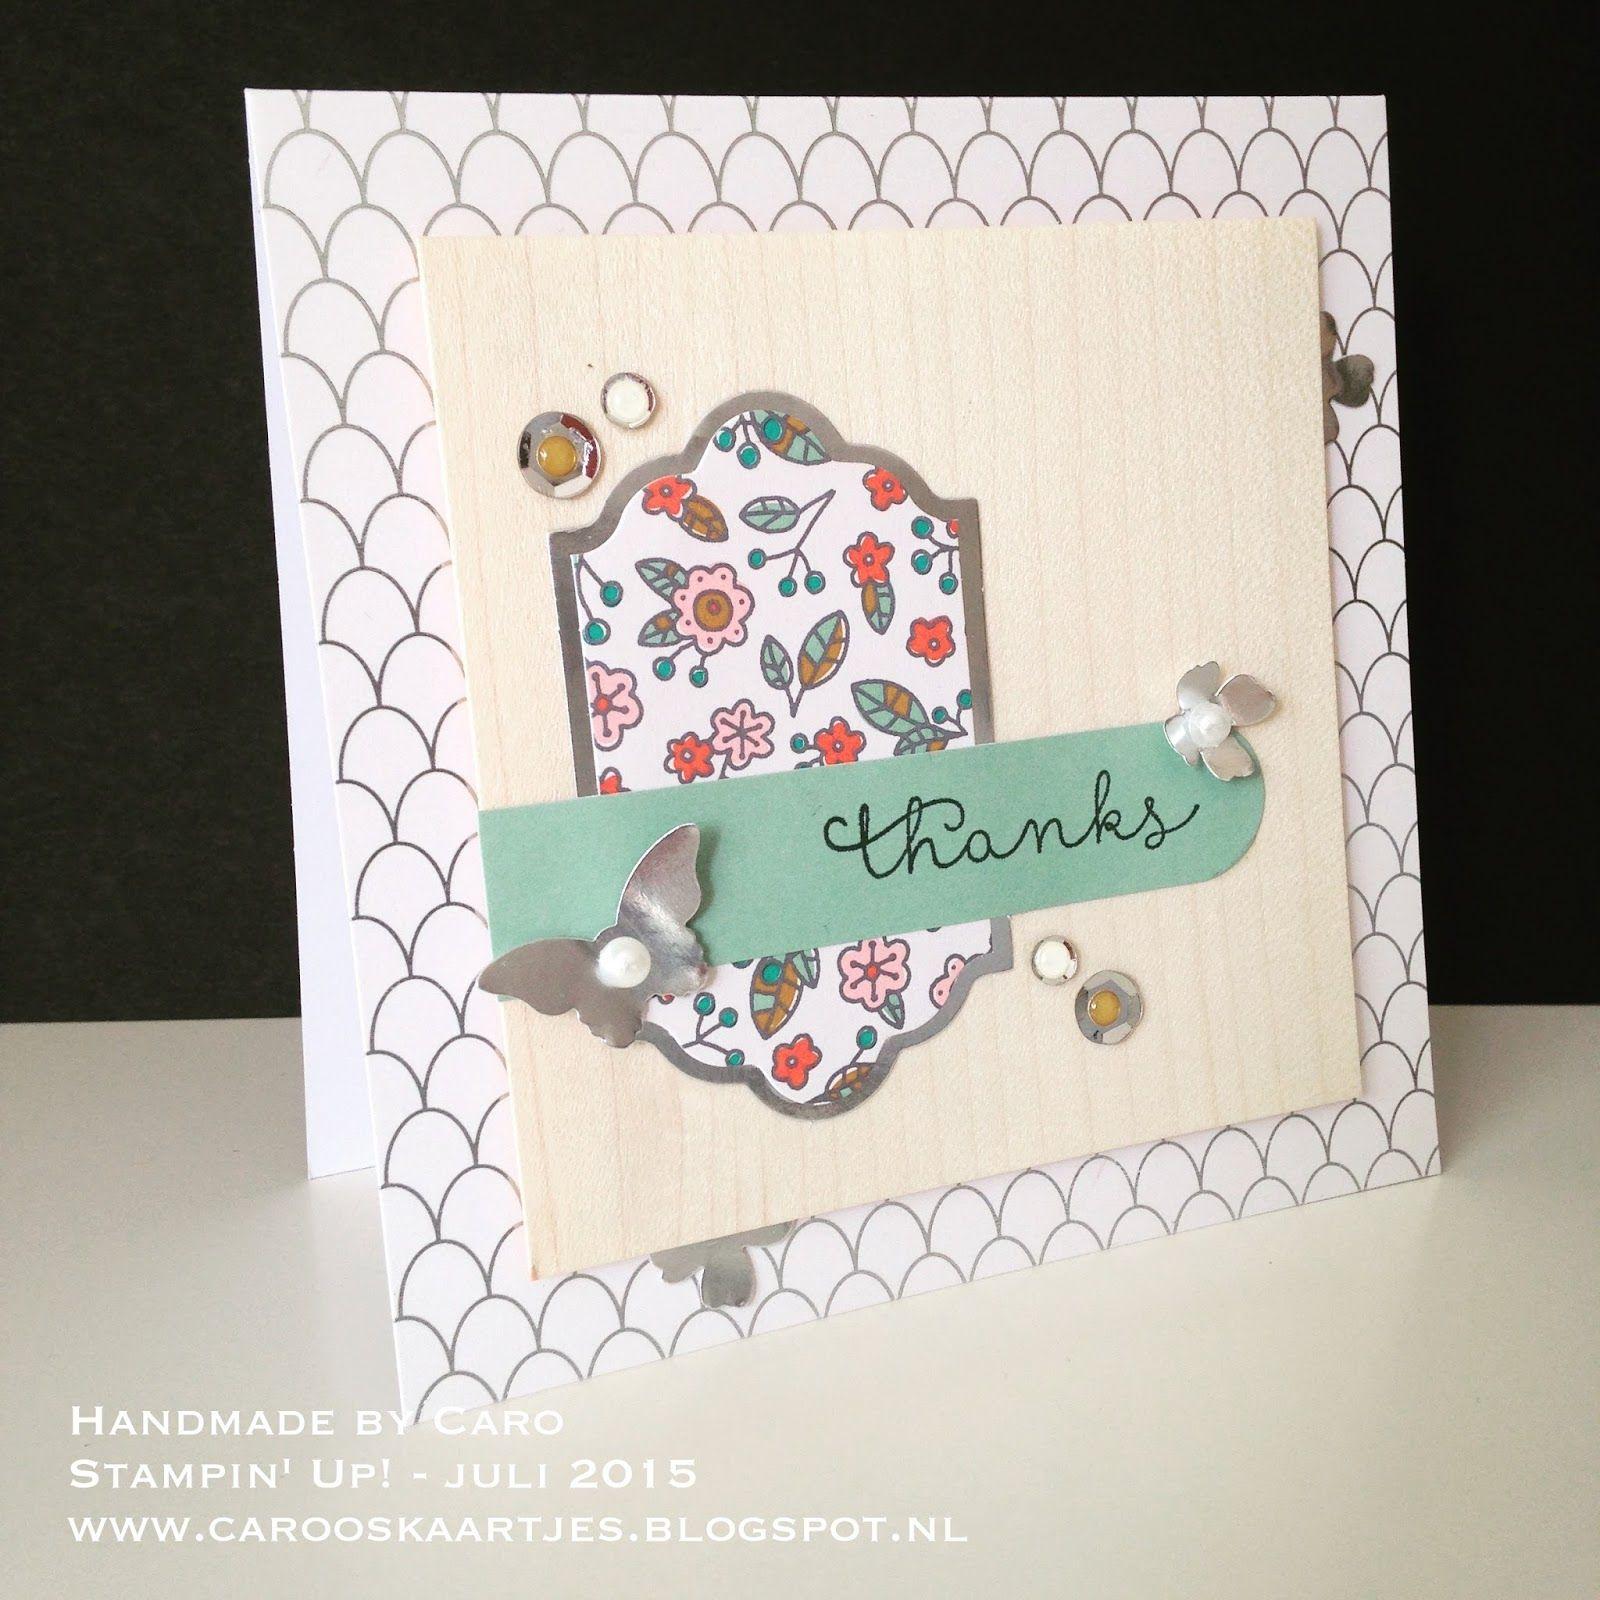 Stampin up cottage greetings cardkit kaarten maken freubelen stampin up cottage greetings card kit part 1 kristyandbryce Images